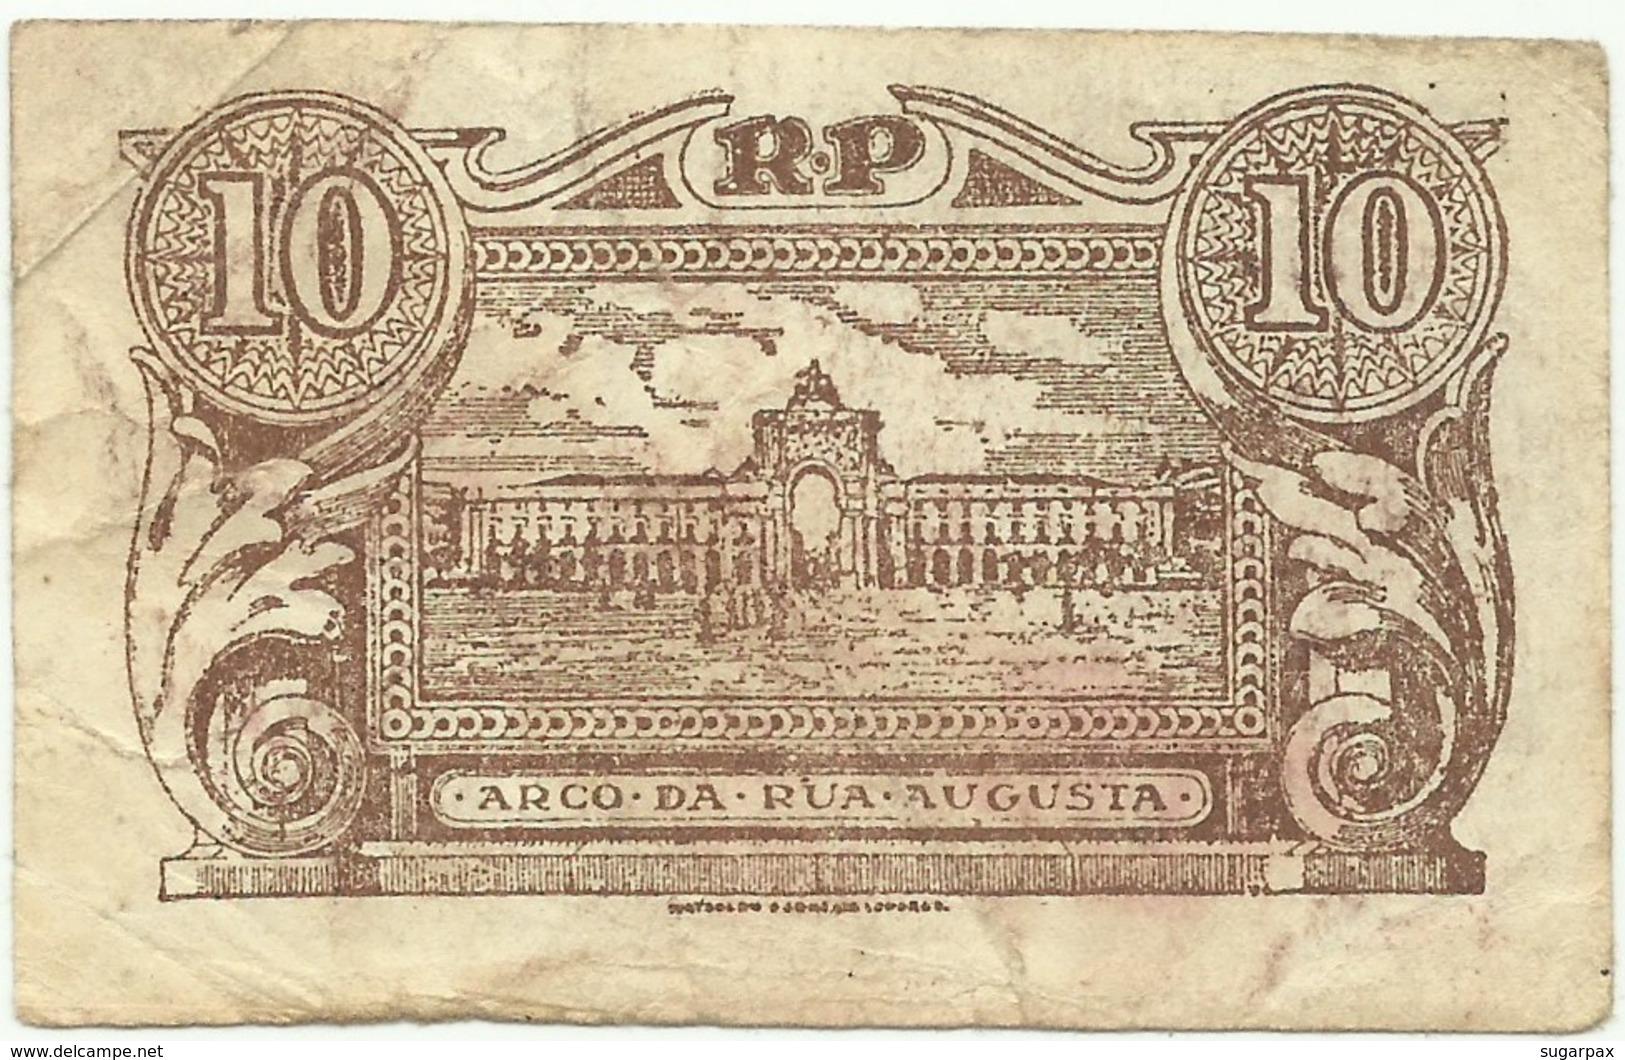 CÉDULA De 10 Centavos - SÉRIE A 2 - CASA Da MOEDA - M. A. N.º 10 - Portugal Emergency Paper Money - Notgeld - Portugal